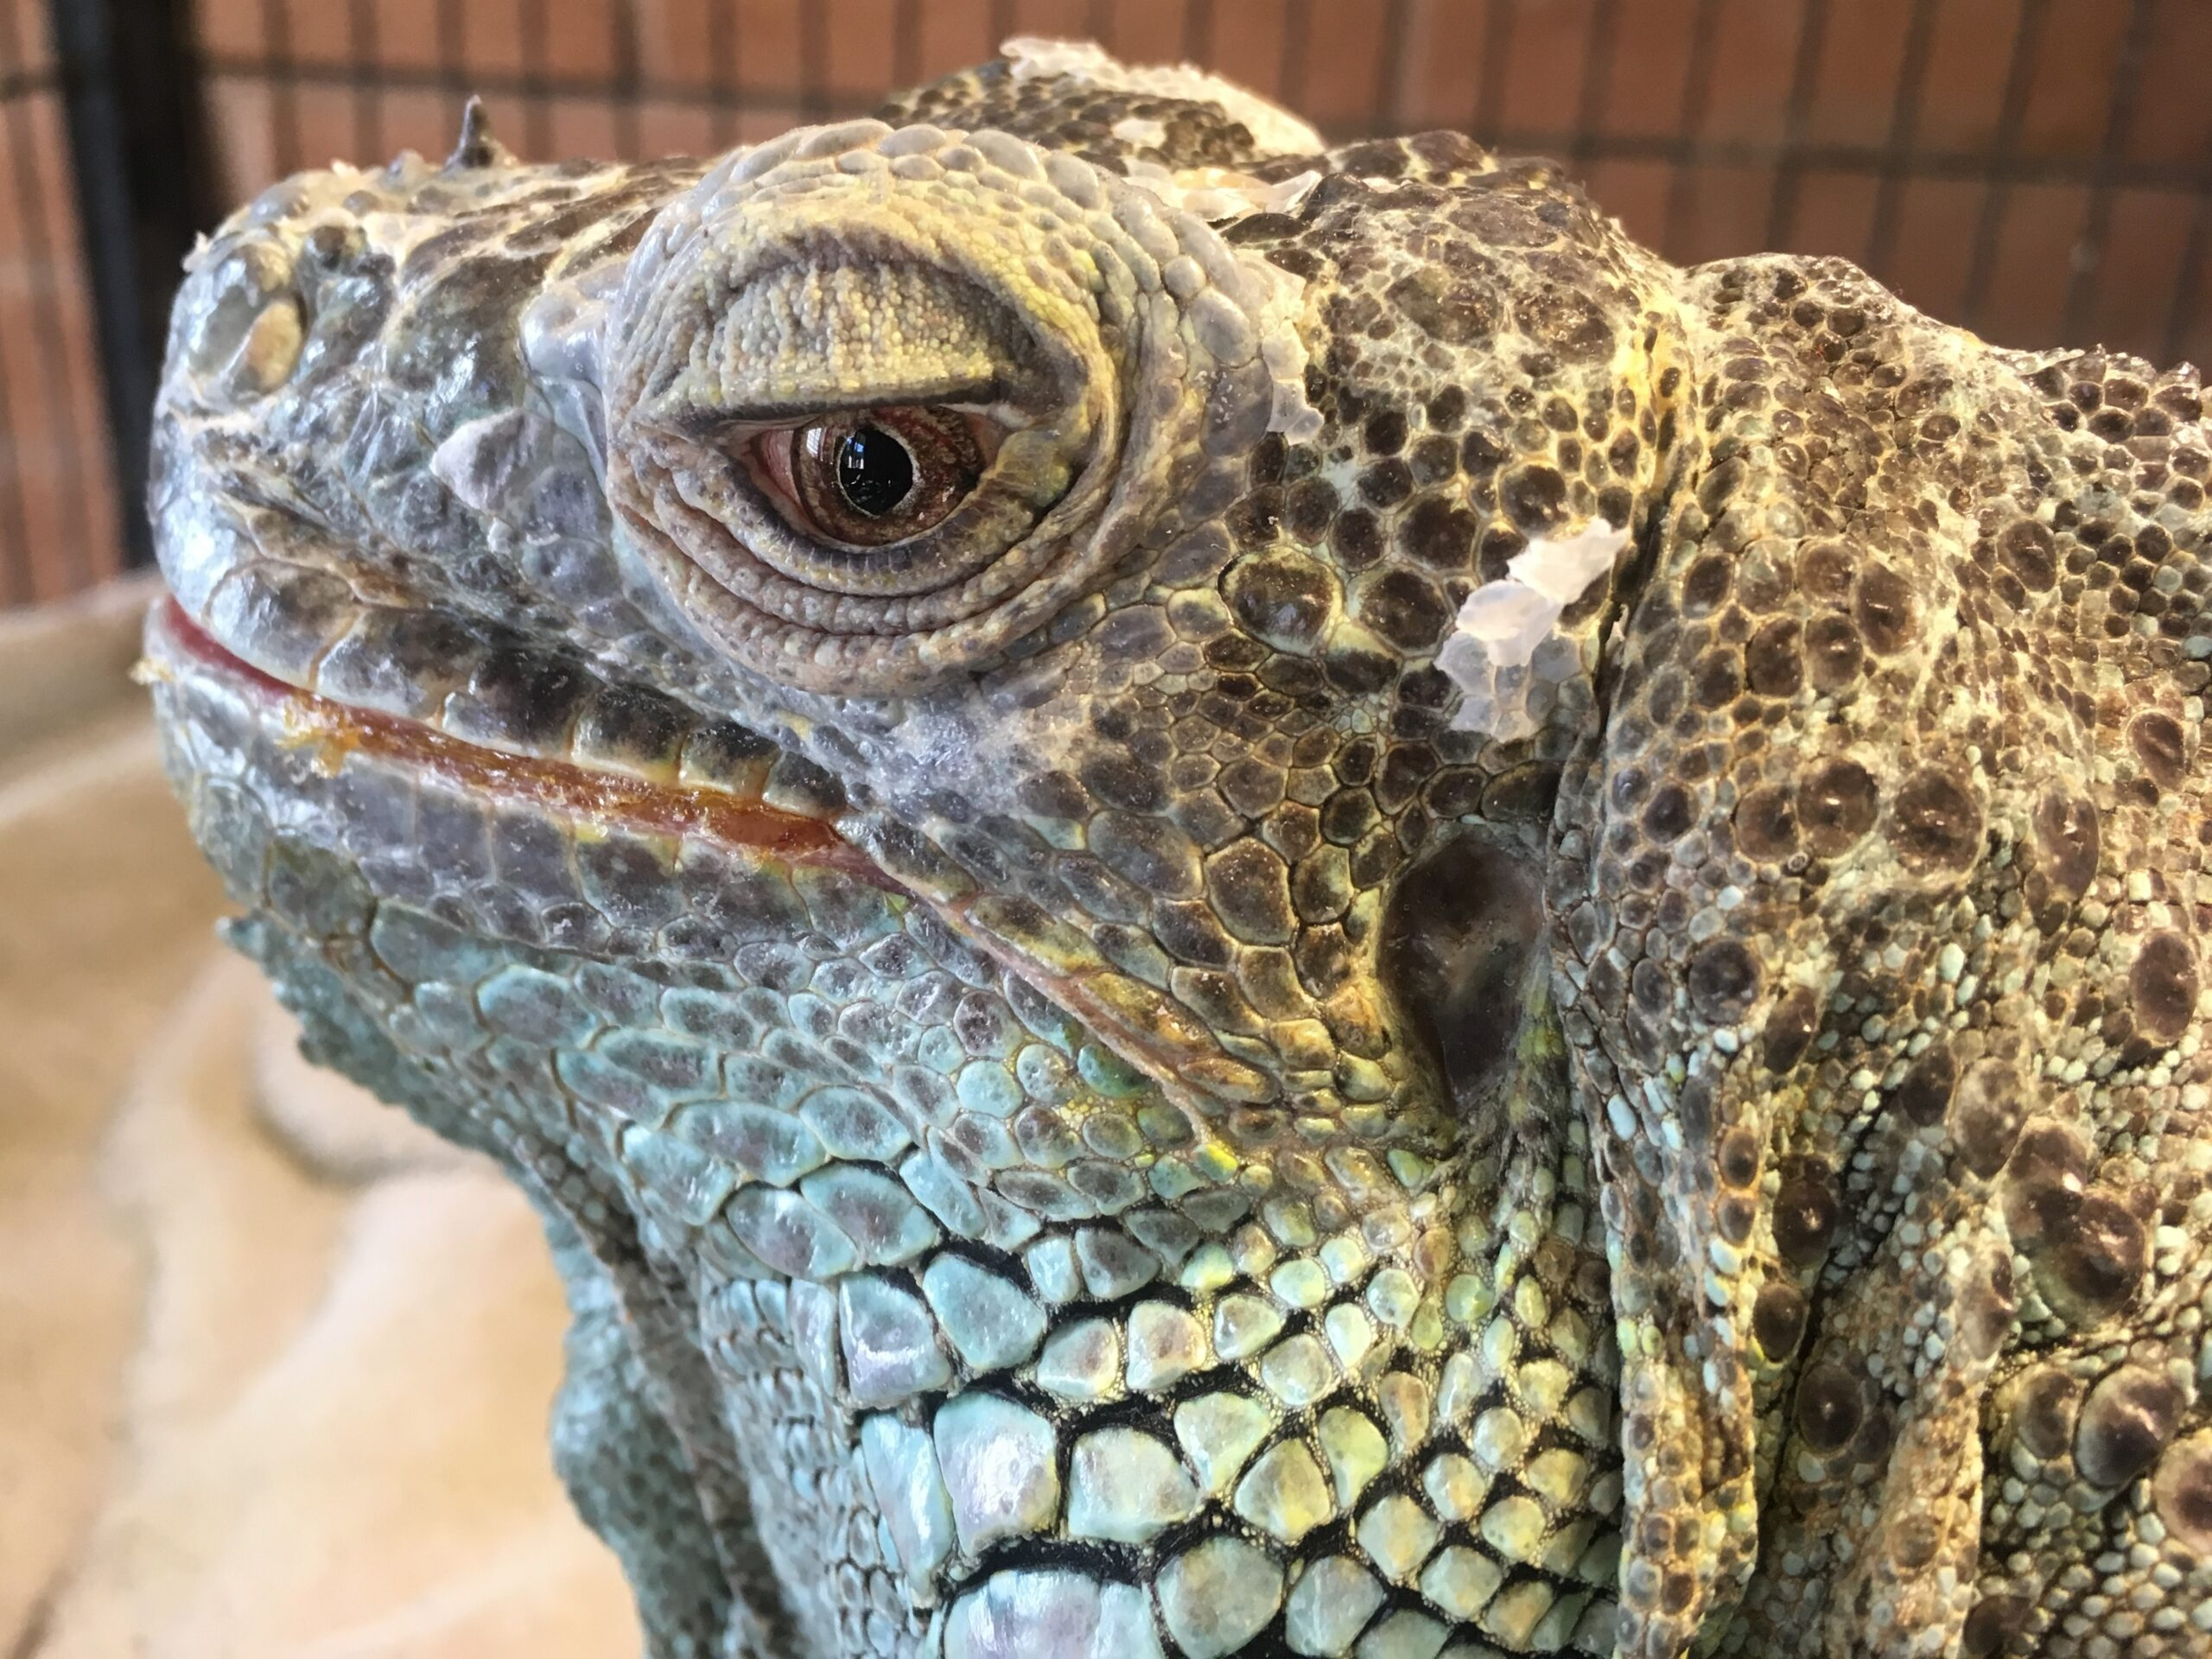 a closeup of the head of a green iguana